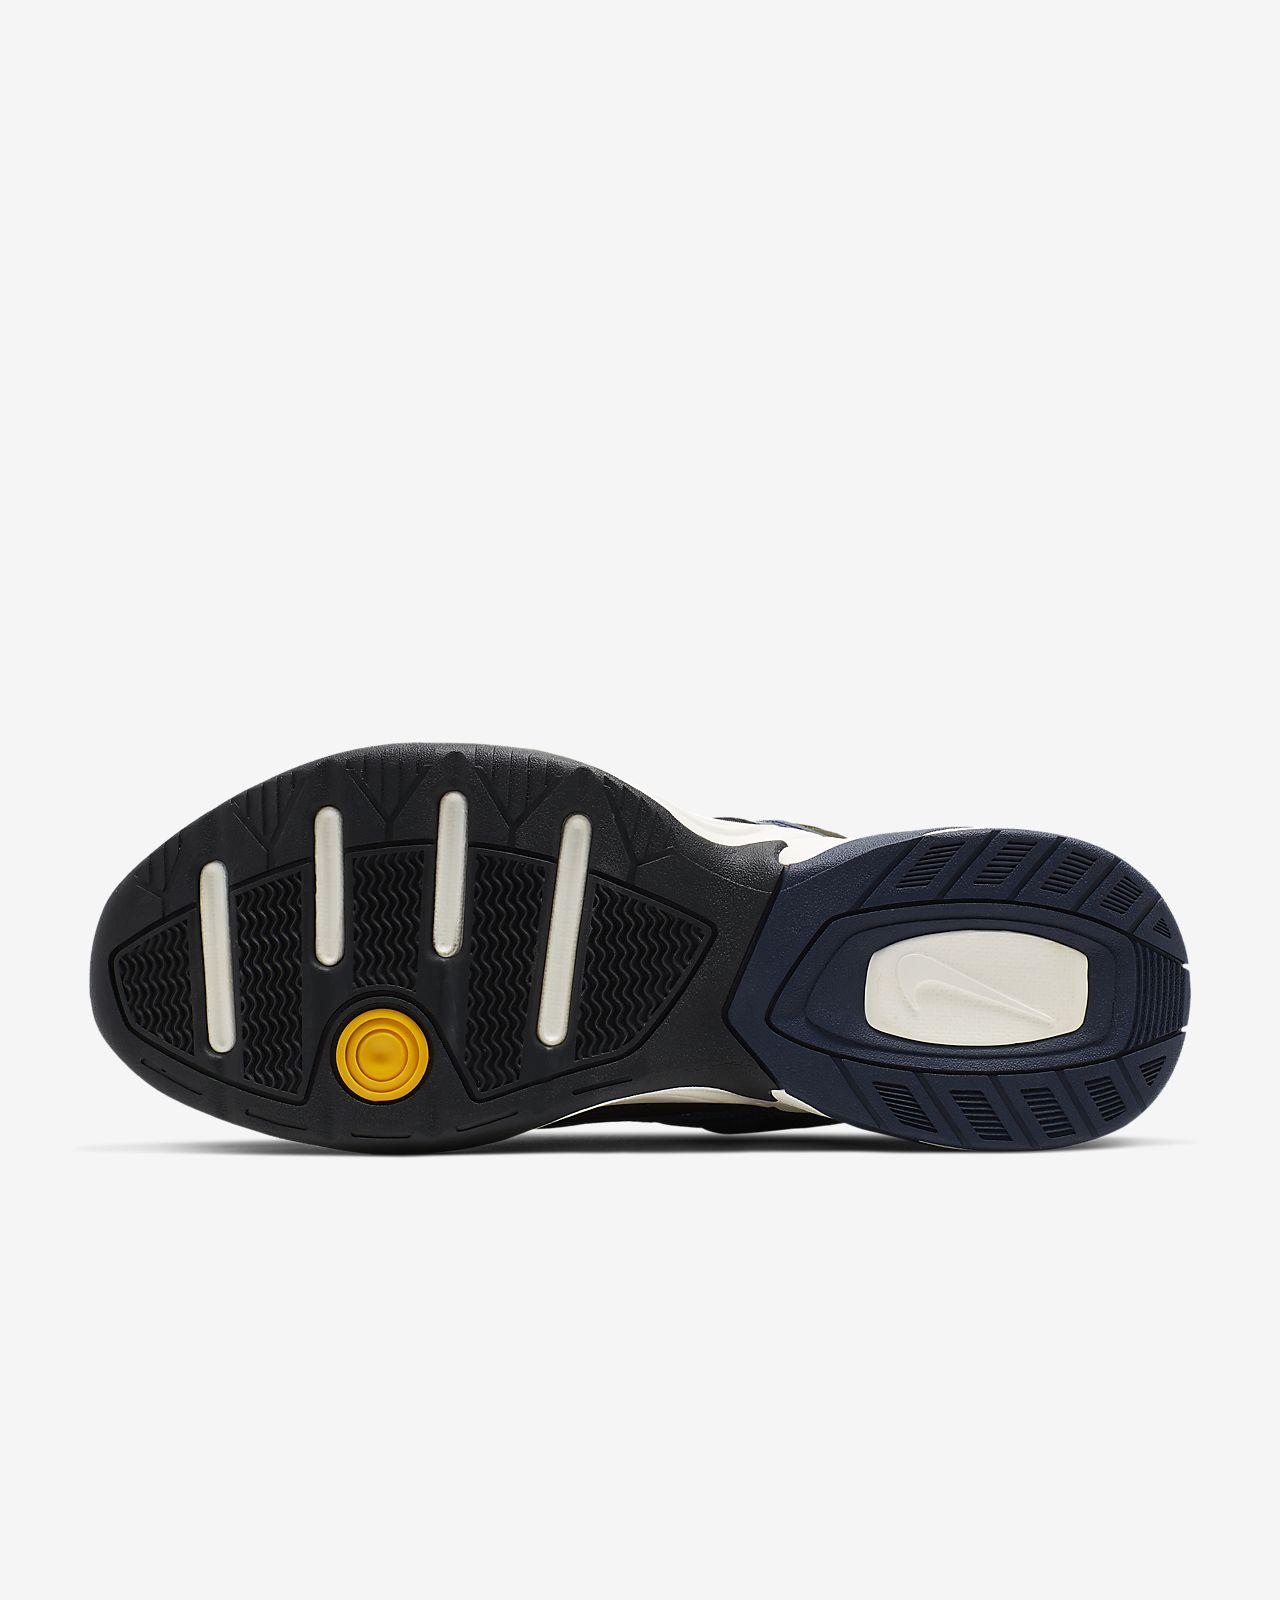 release date 2a595 a755e ... Nike M2K Tekno Men s Shoe